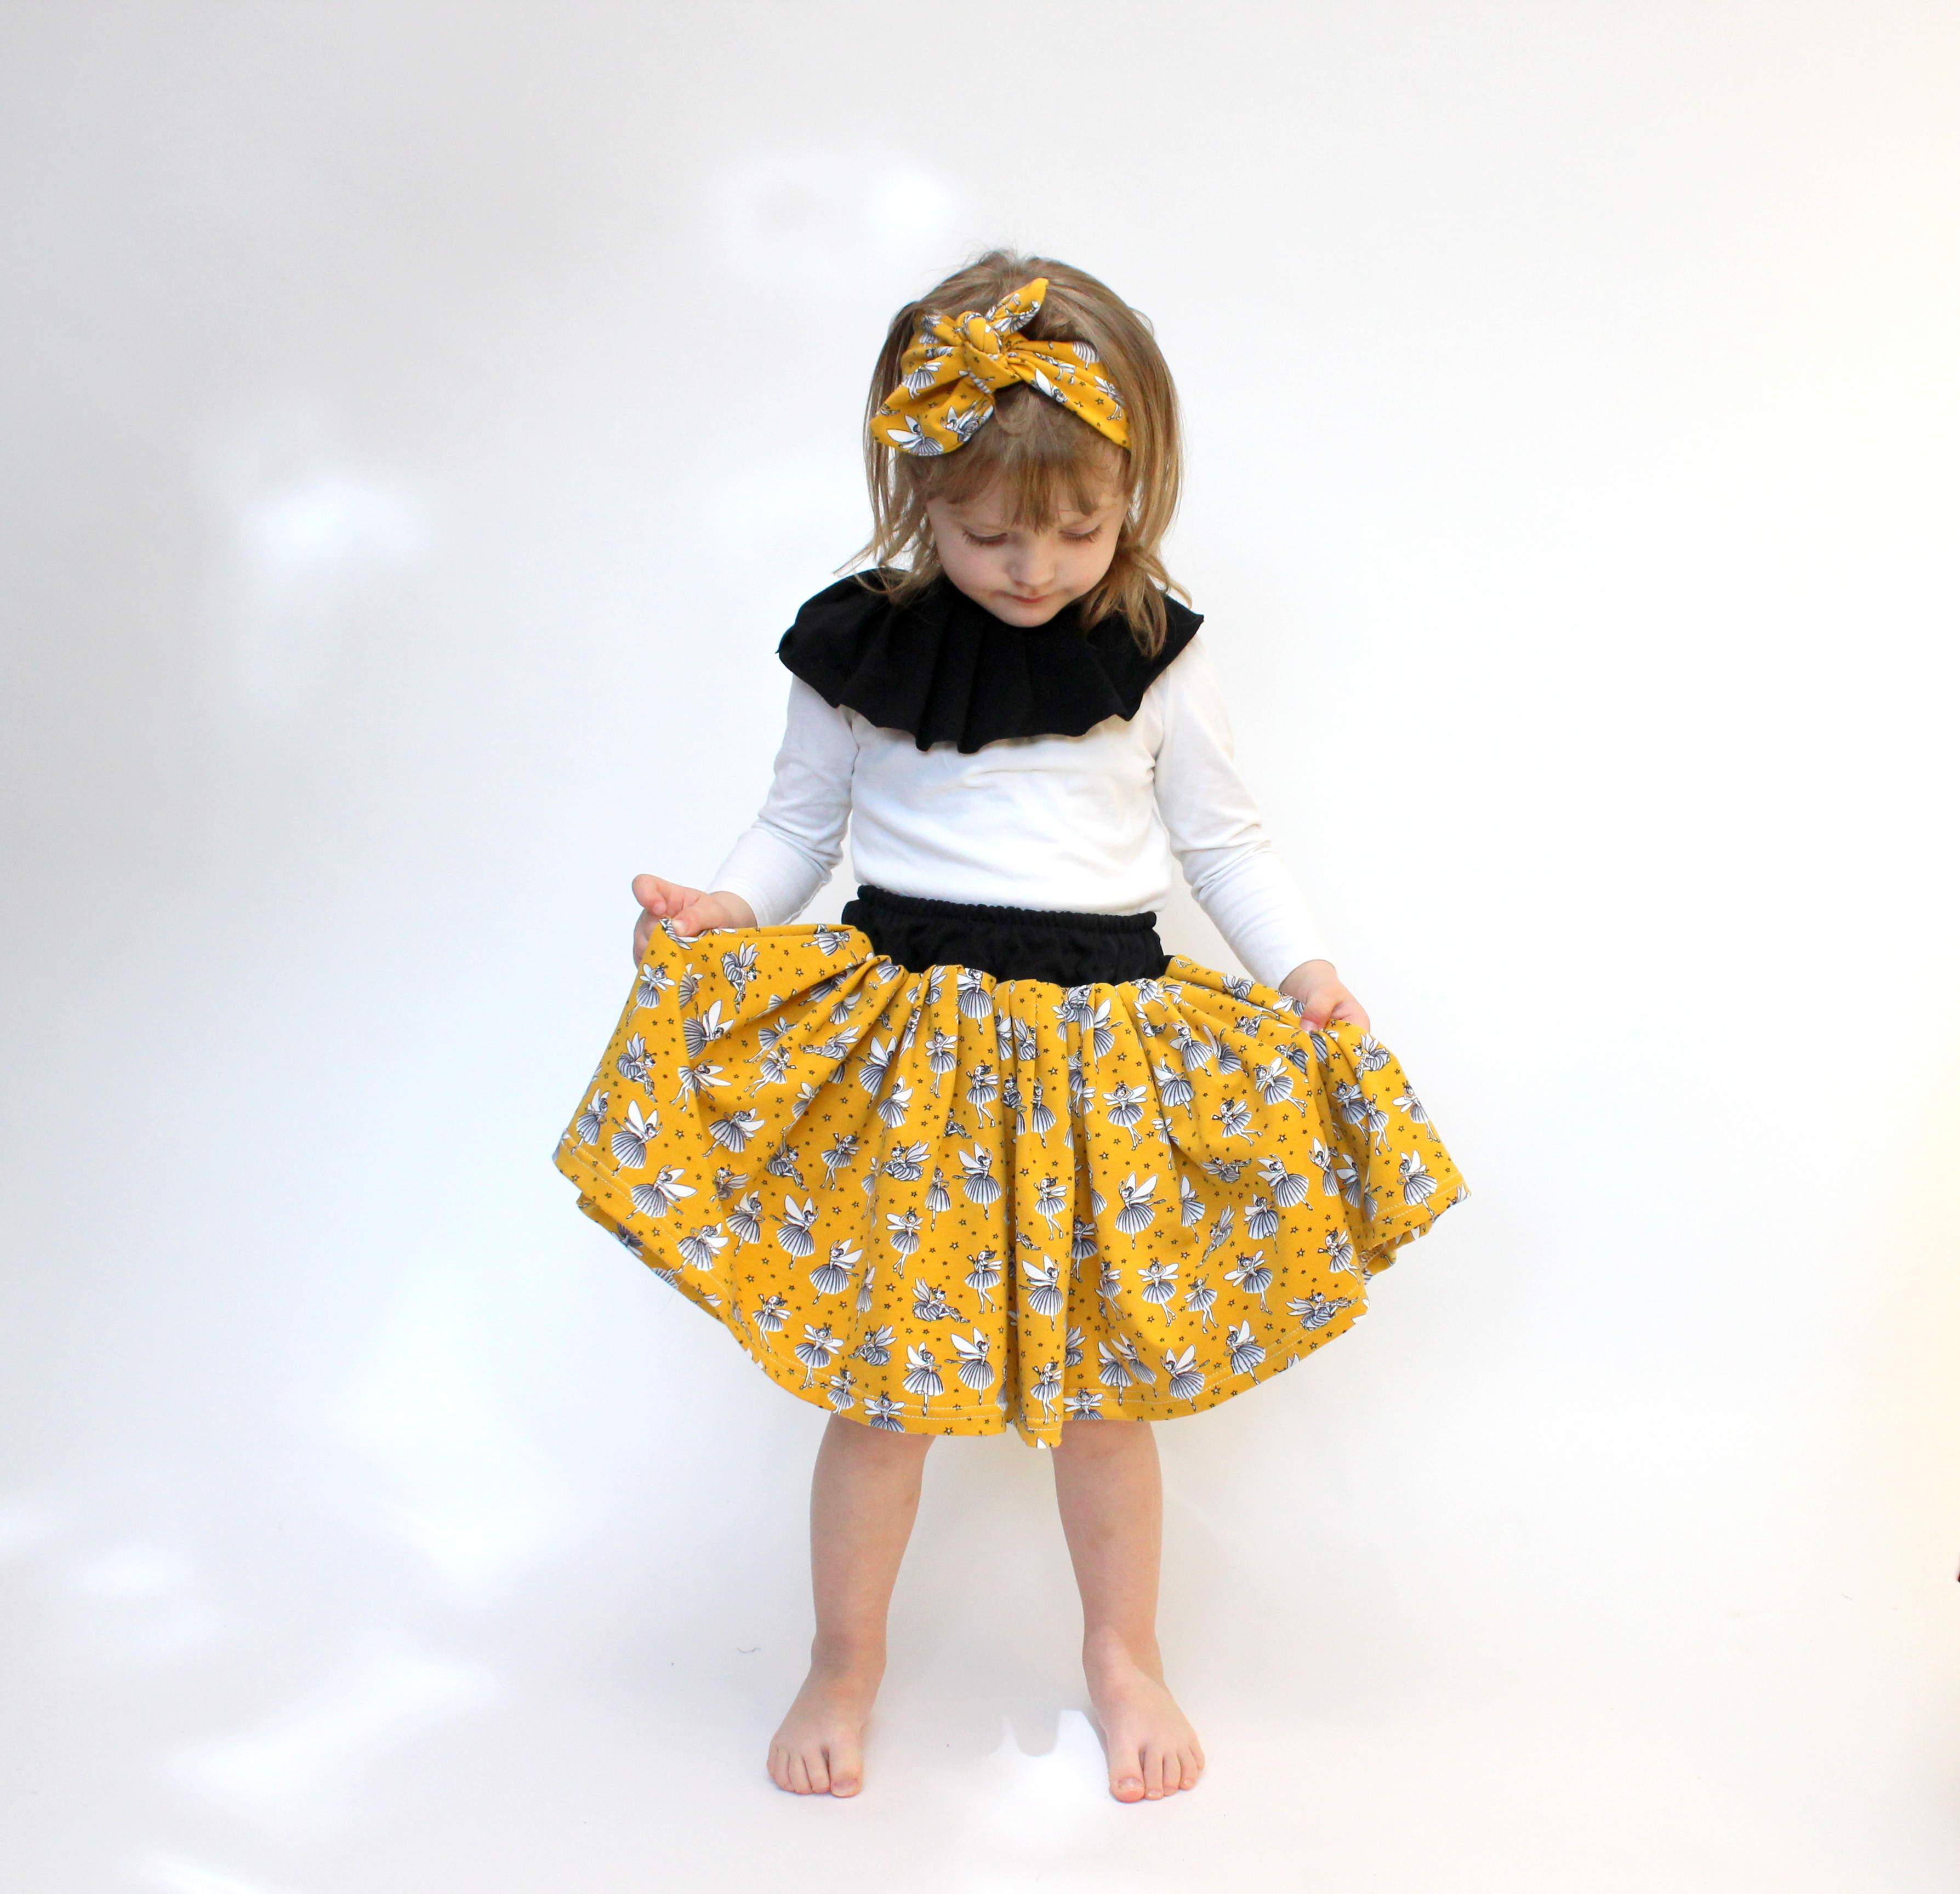 e0eef4e15fd8 Detská móda dievčatá